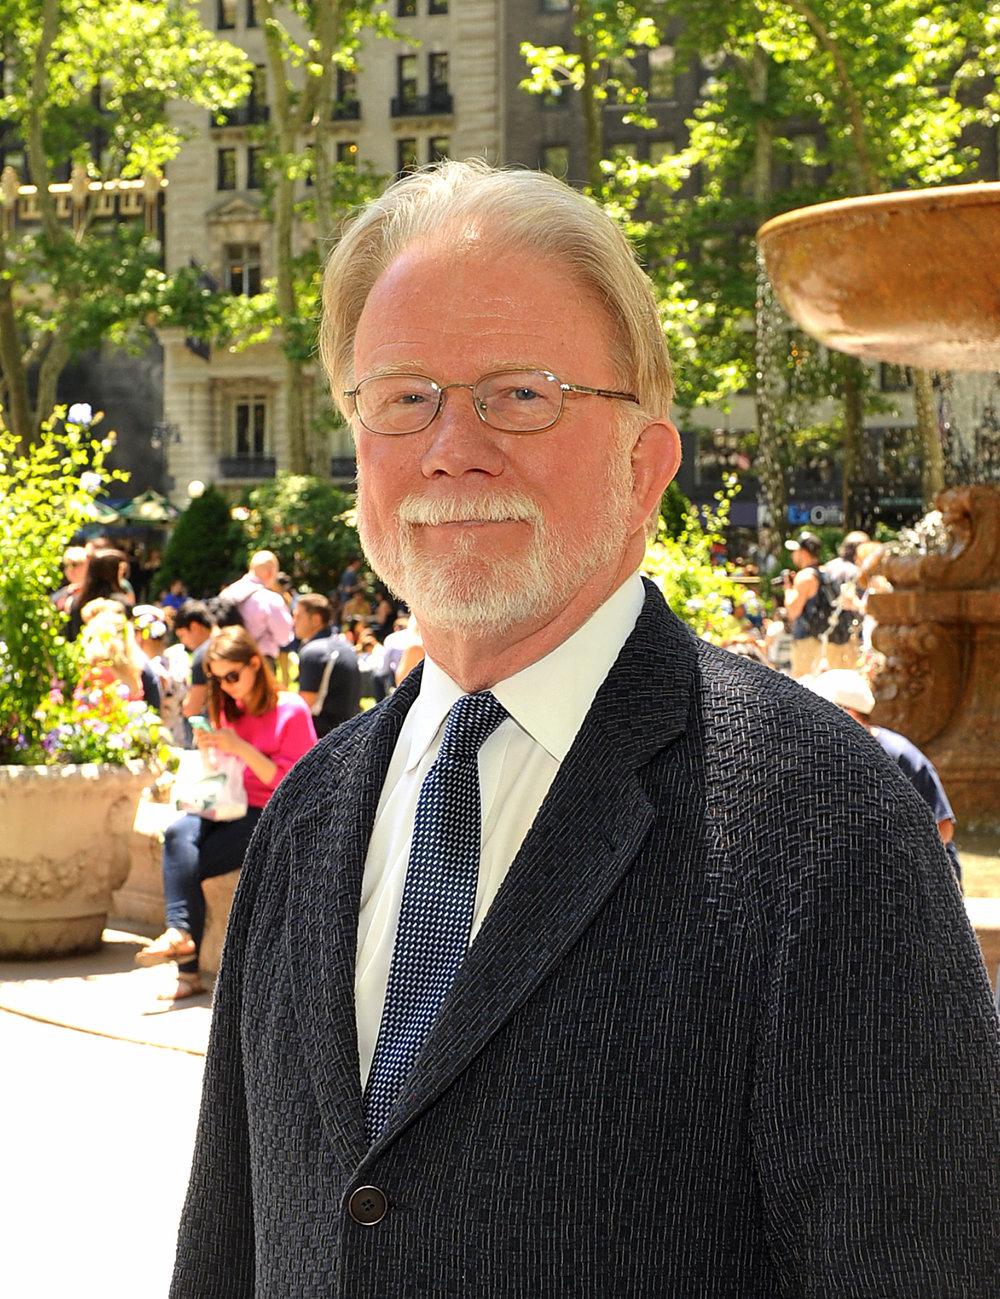 Charles McKinney